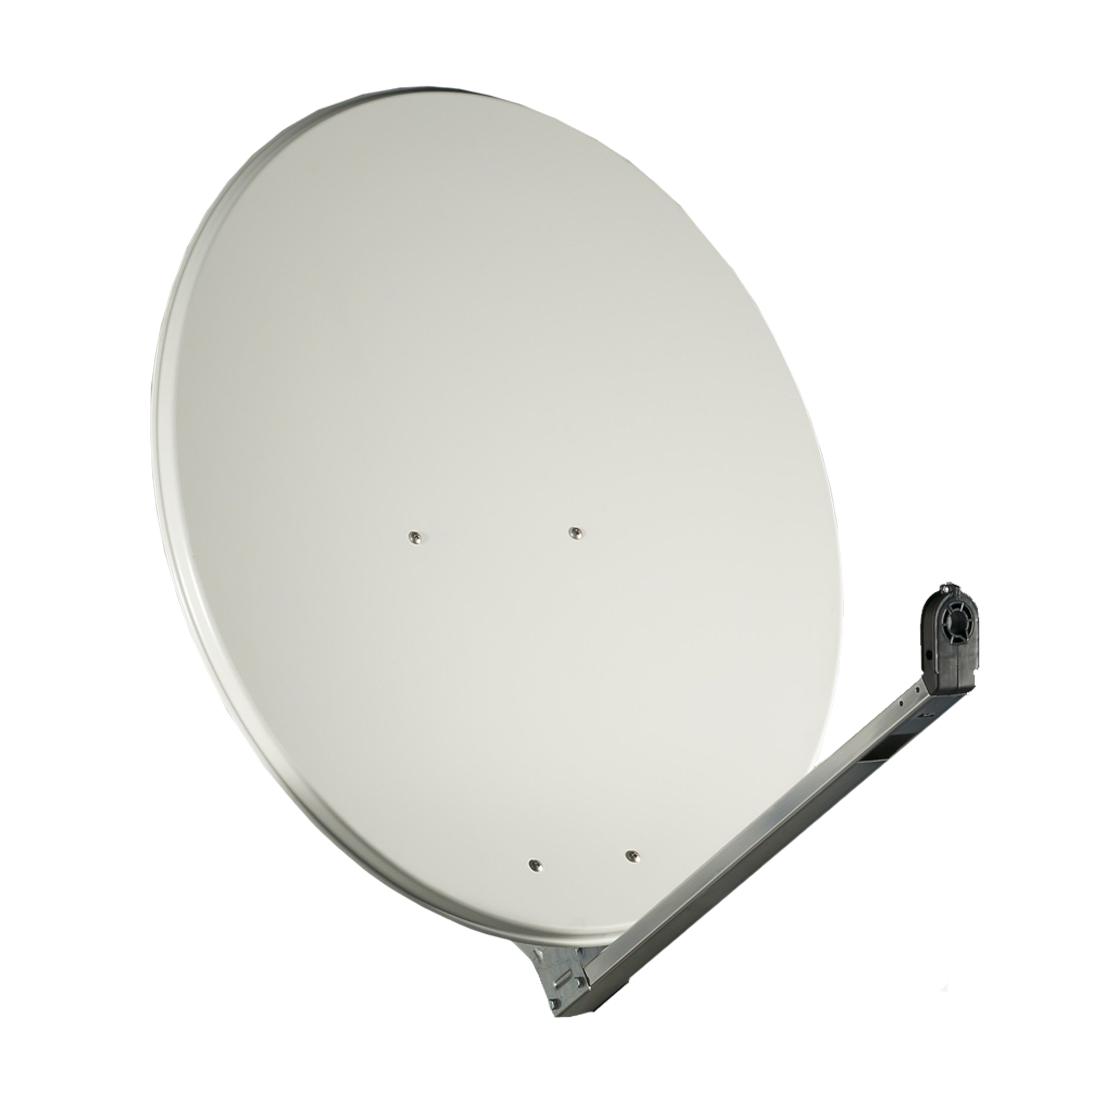 Gibertini Sat Antenne L Serie Aluminium Satellitenschüssel Ziegelrot 100cm MONANT-014